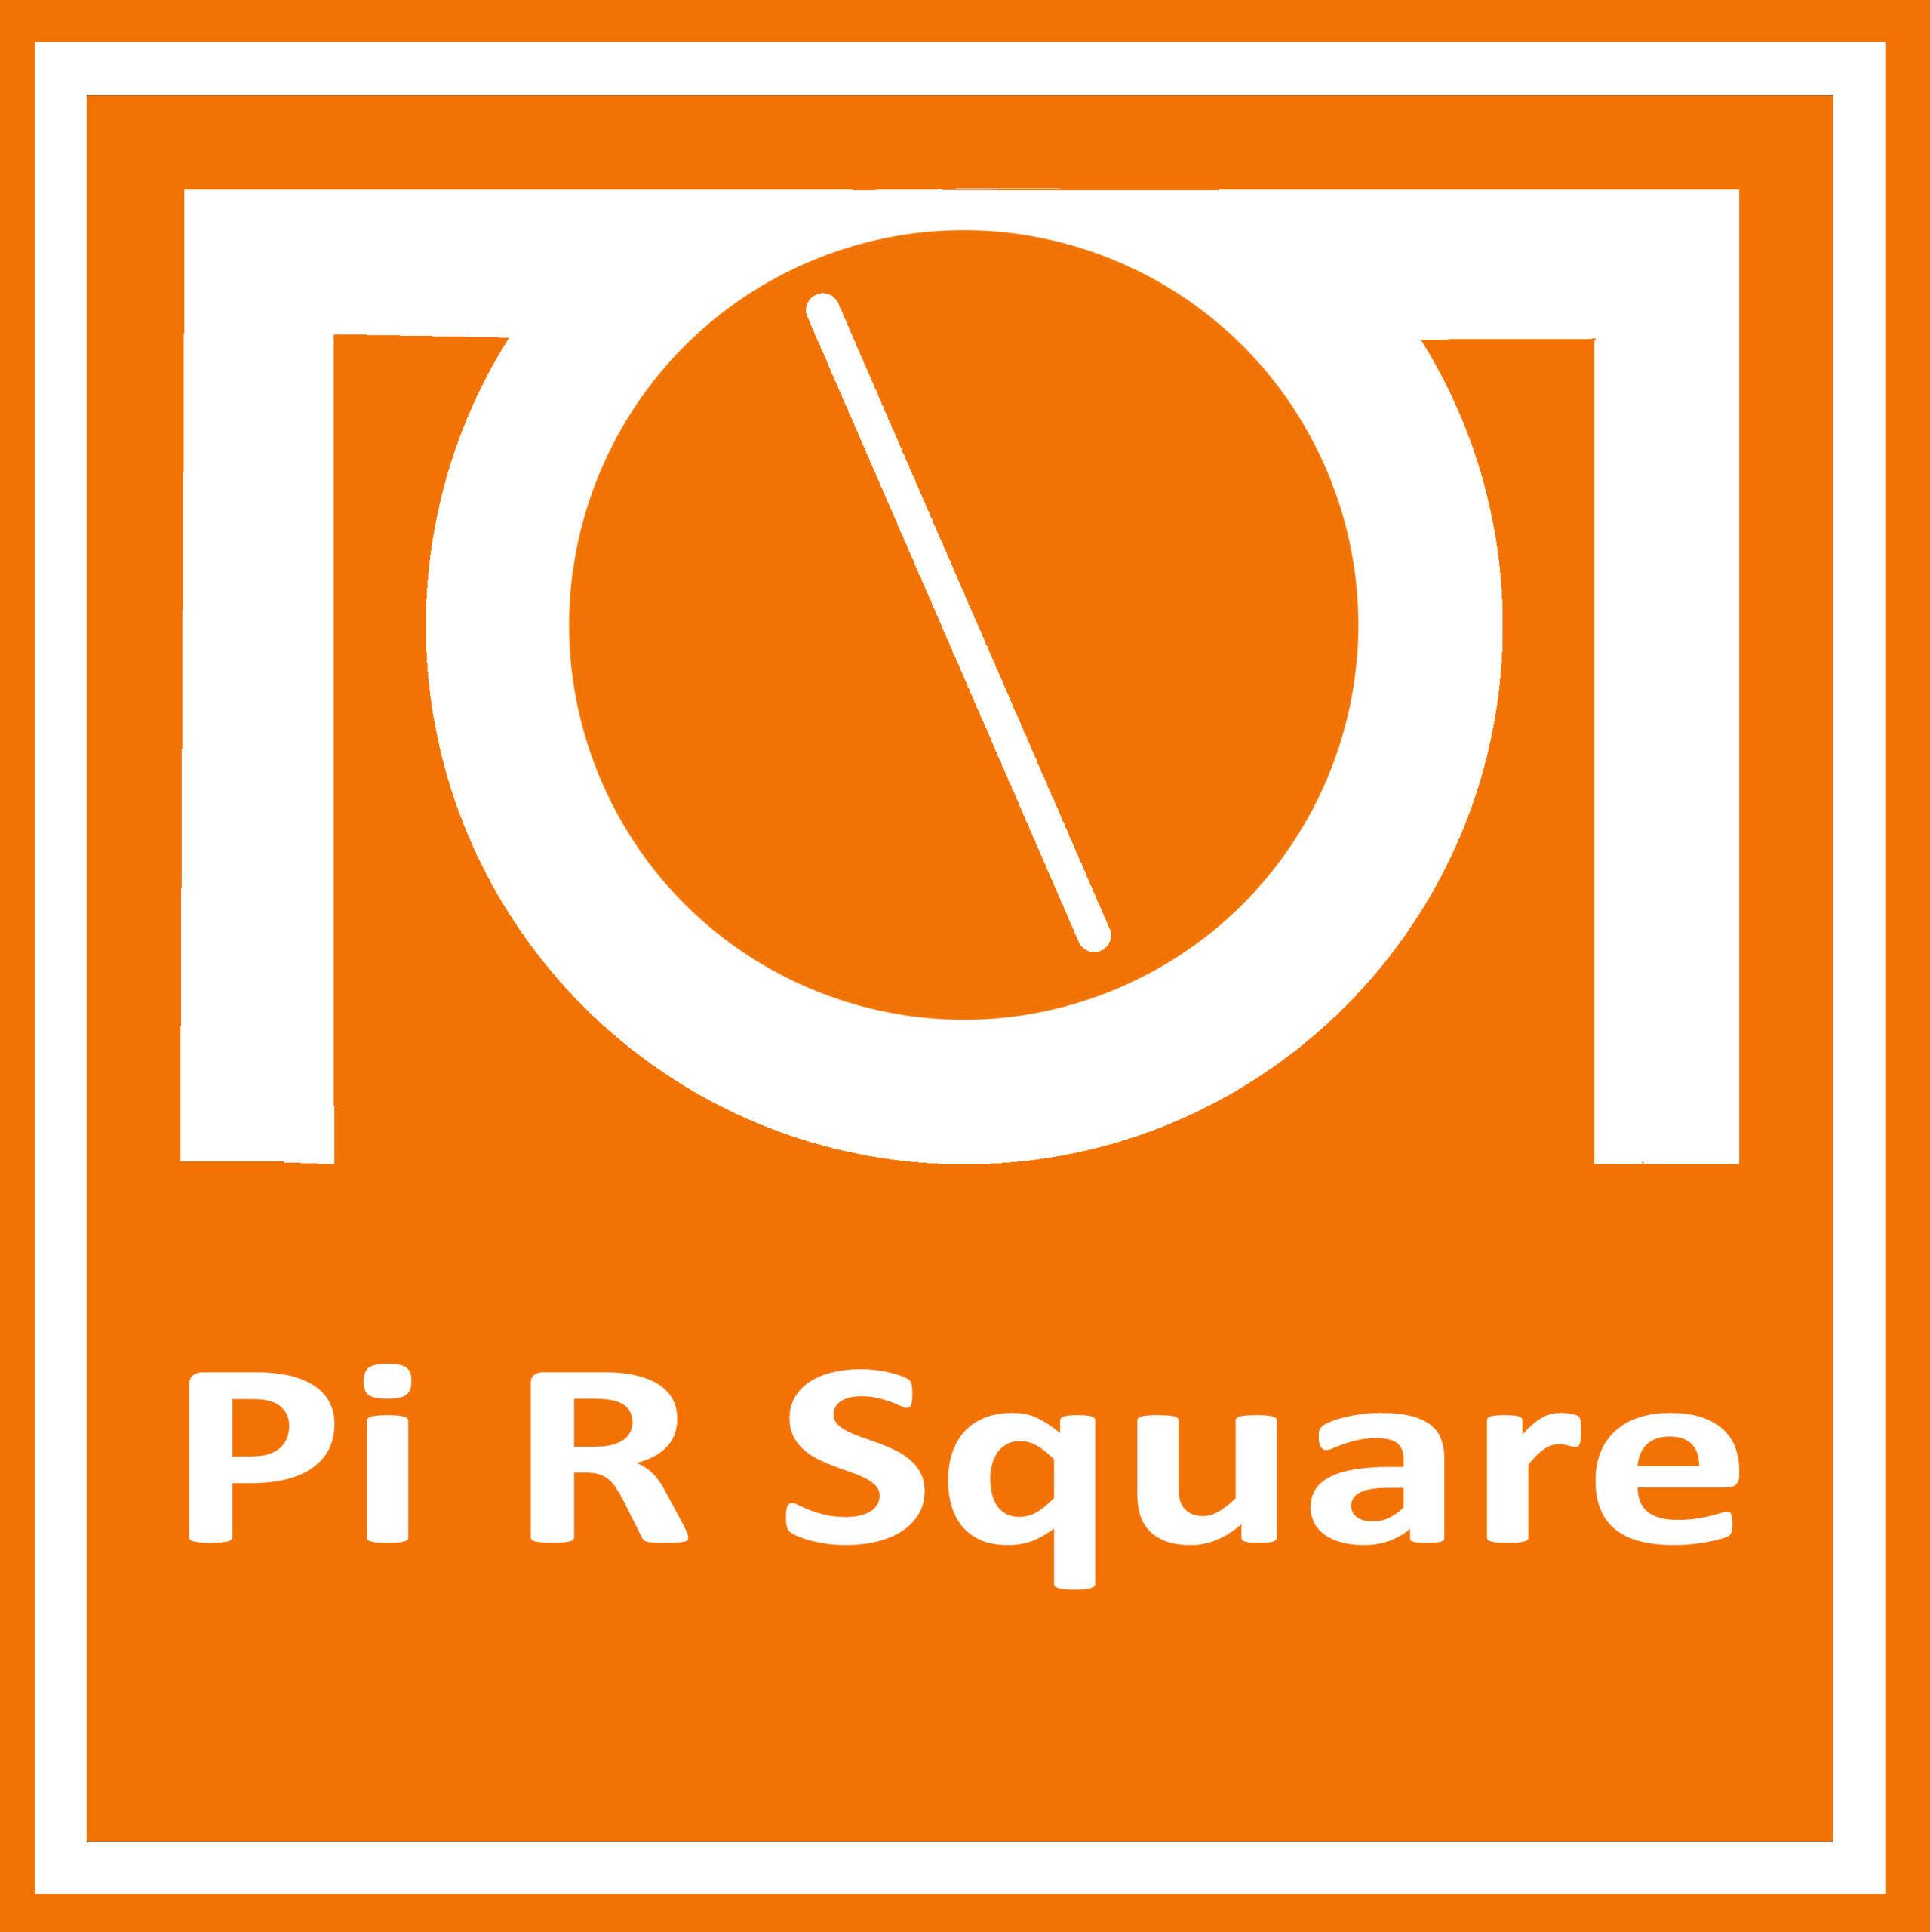 Pi R Square Digital Solutions Pvt Ltd